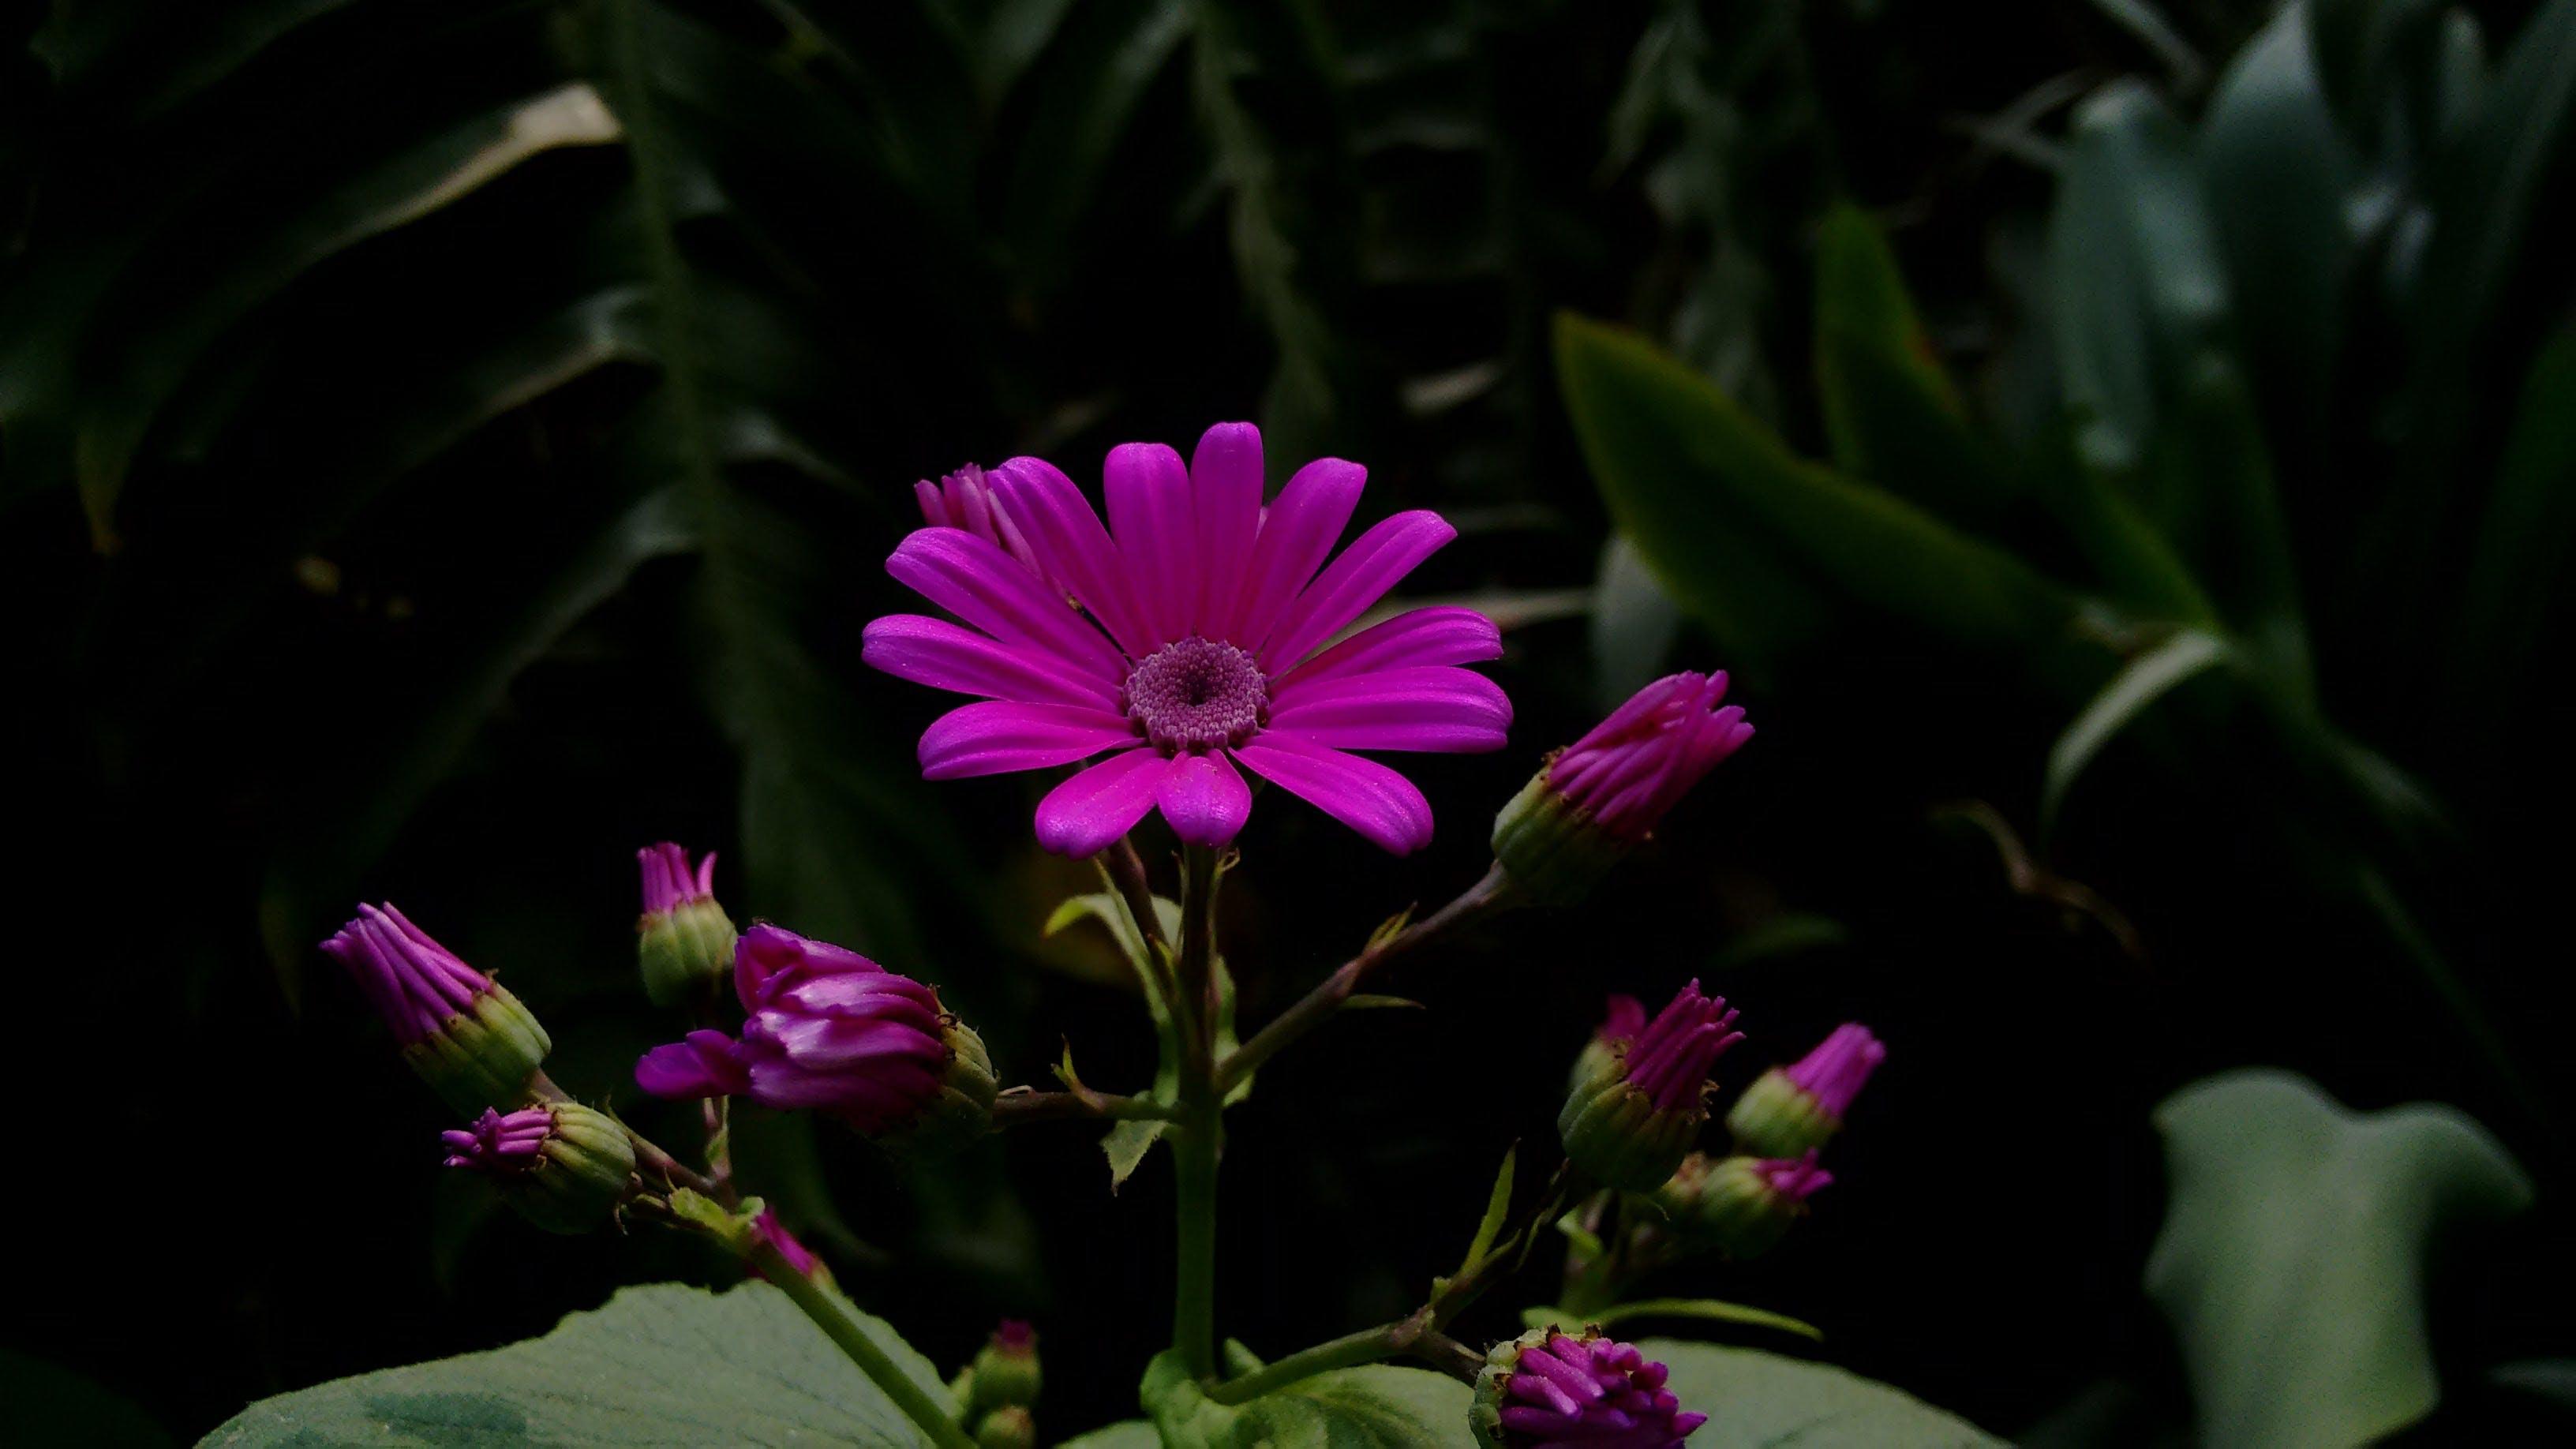 Photo of Purple Gerbera Daisy Flowers